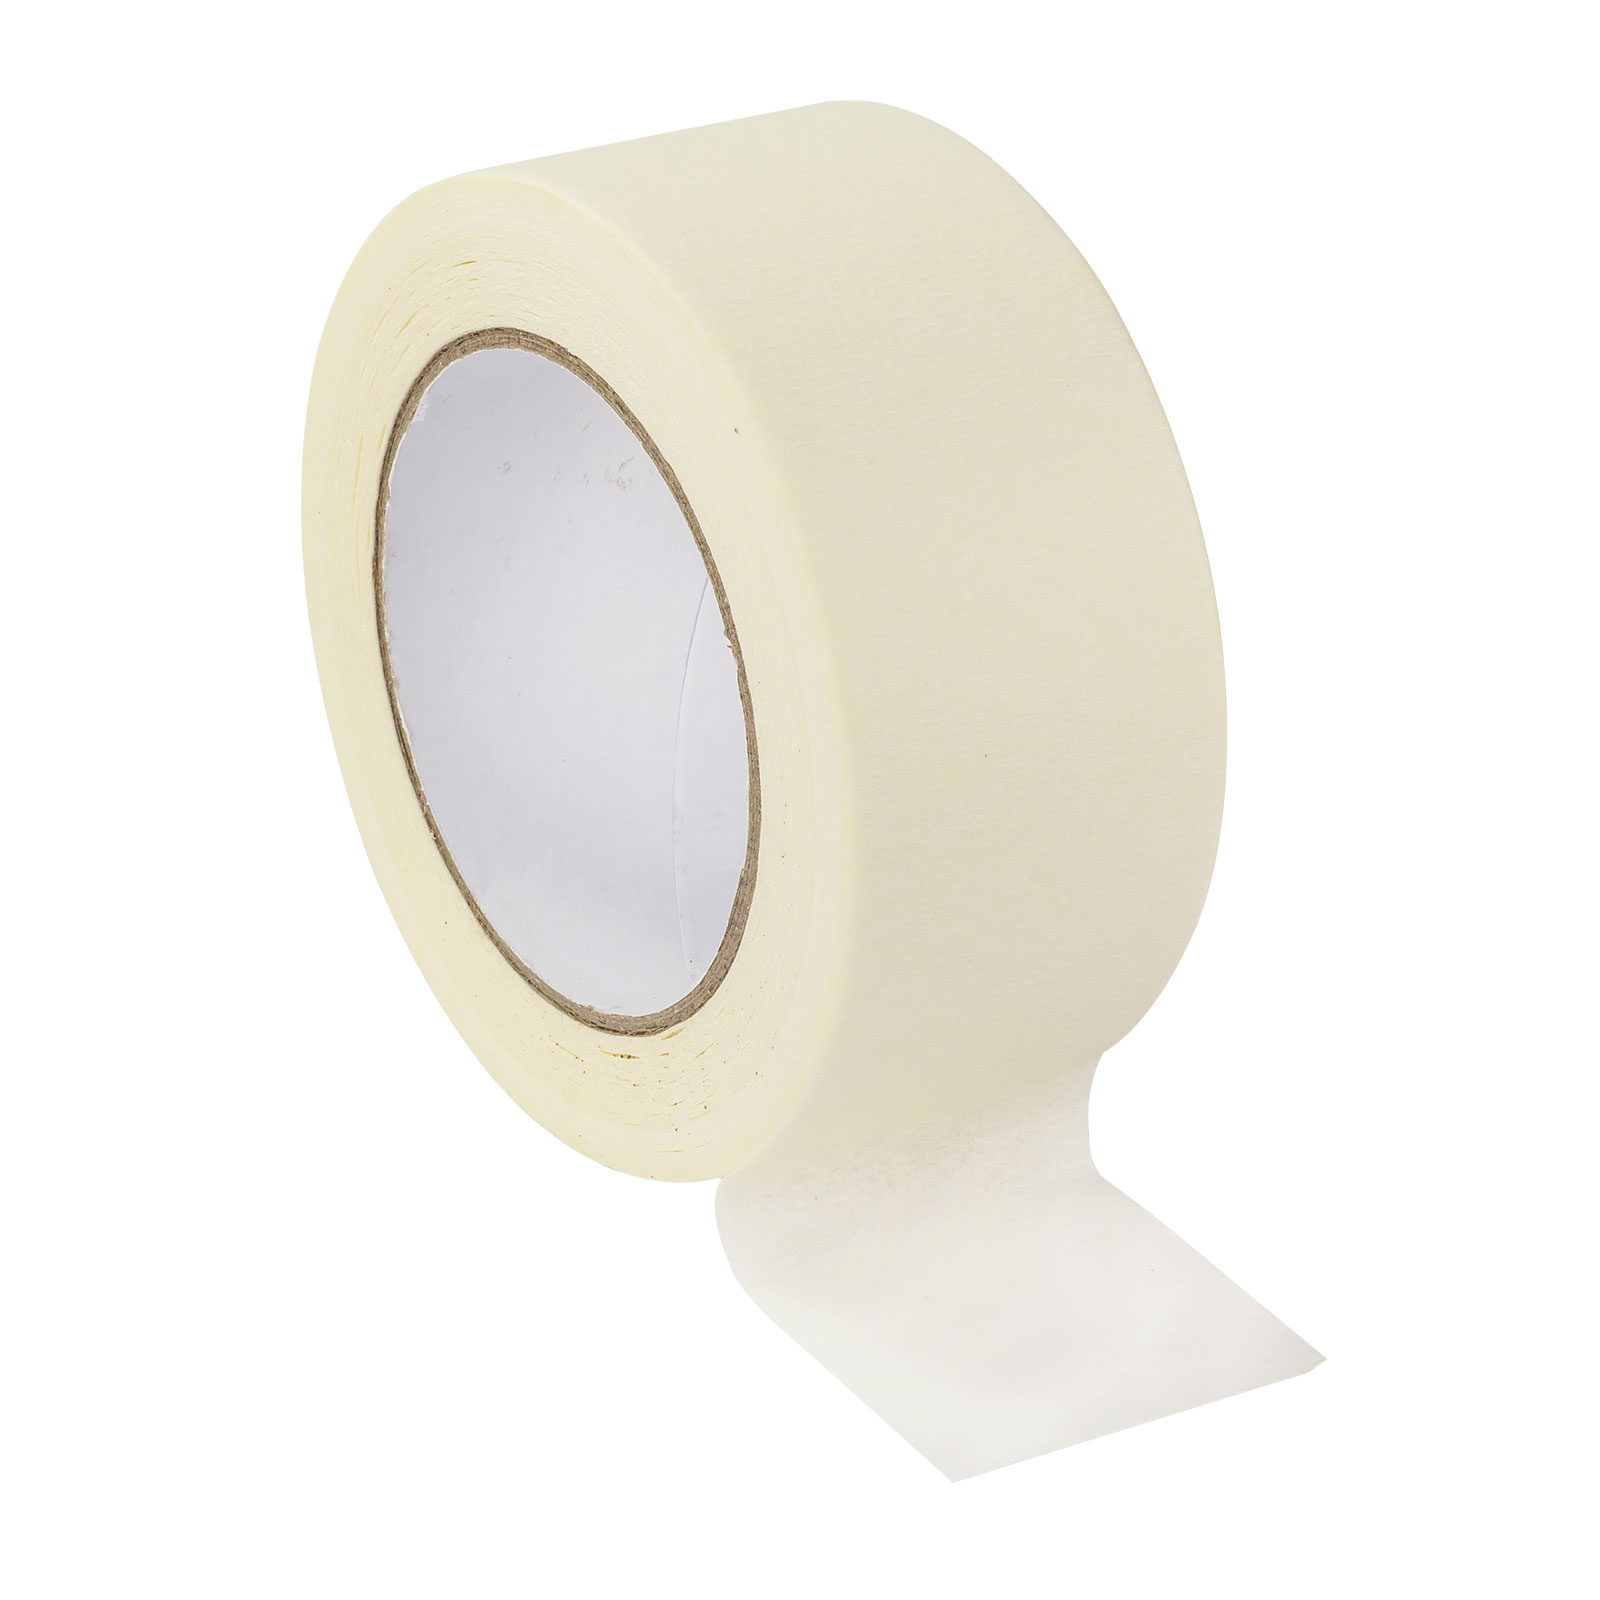 Dema Malerkreppband / Maler Abklebeband 50 mm x 50 m 80372